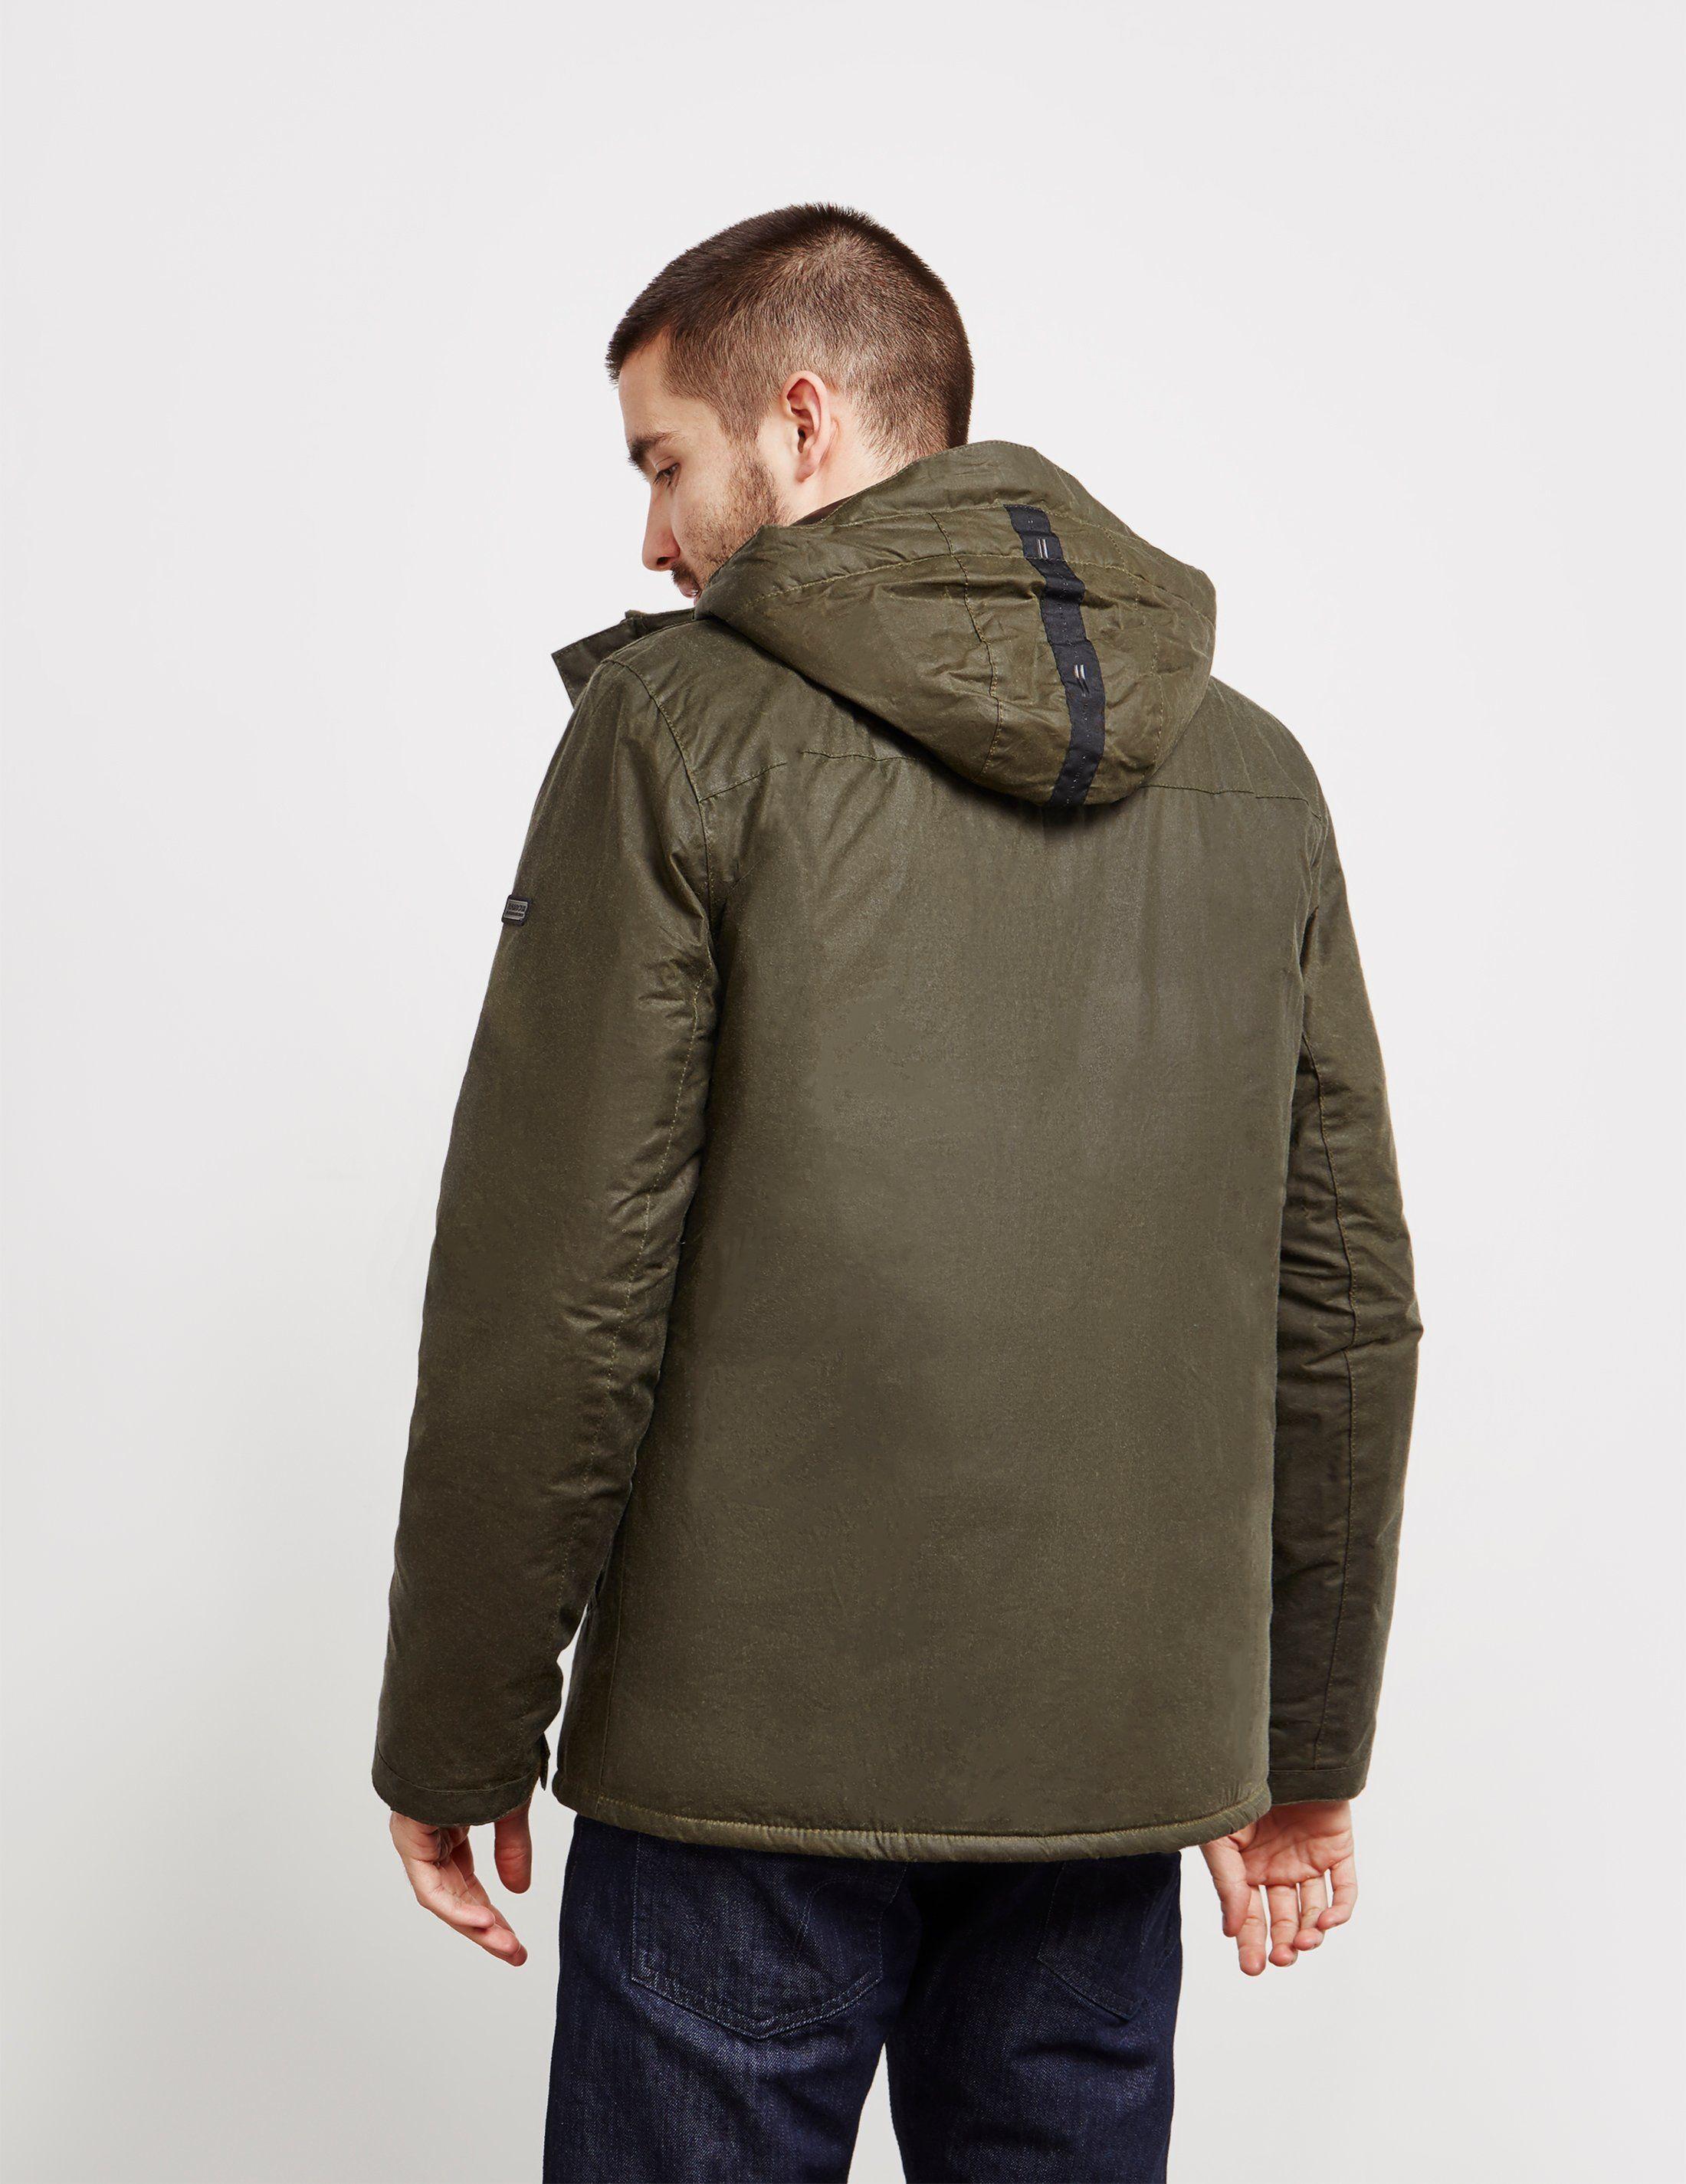 Barbour International Triple Waxed Jacket